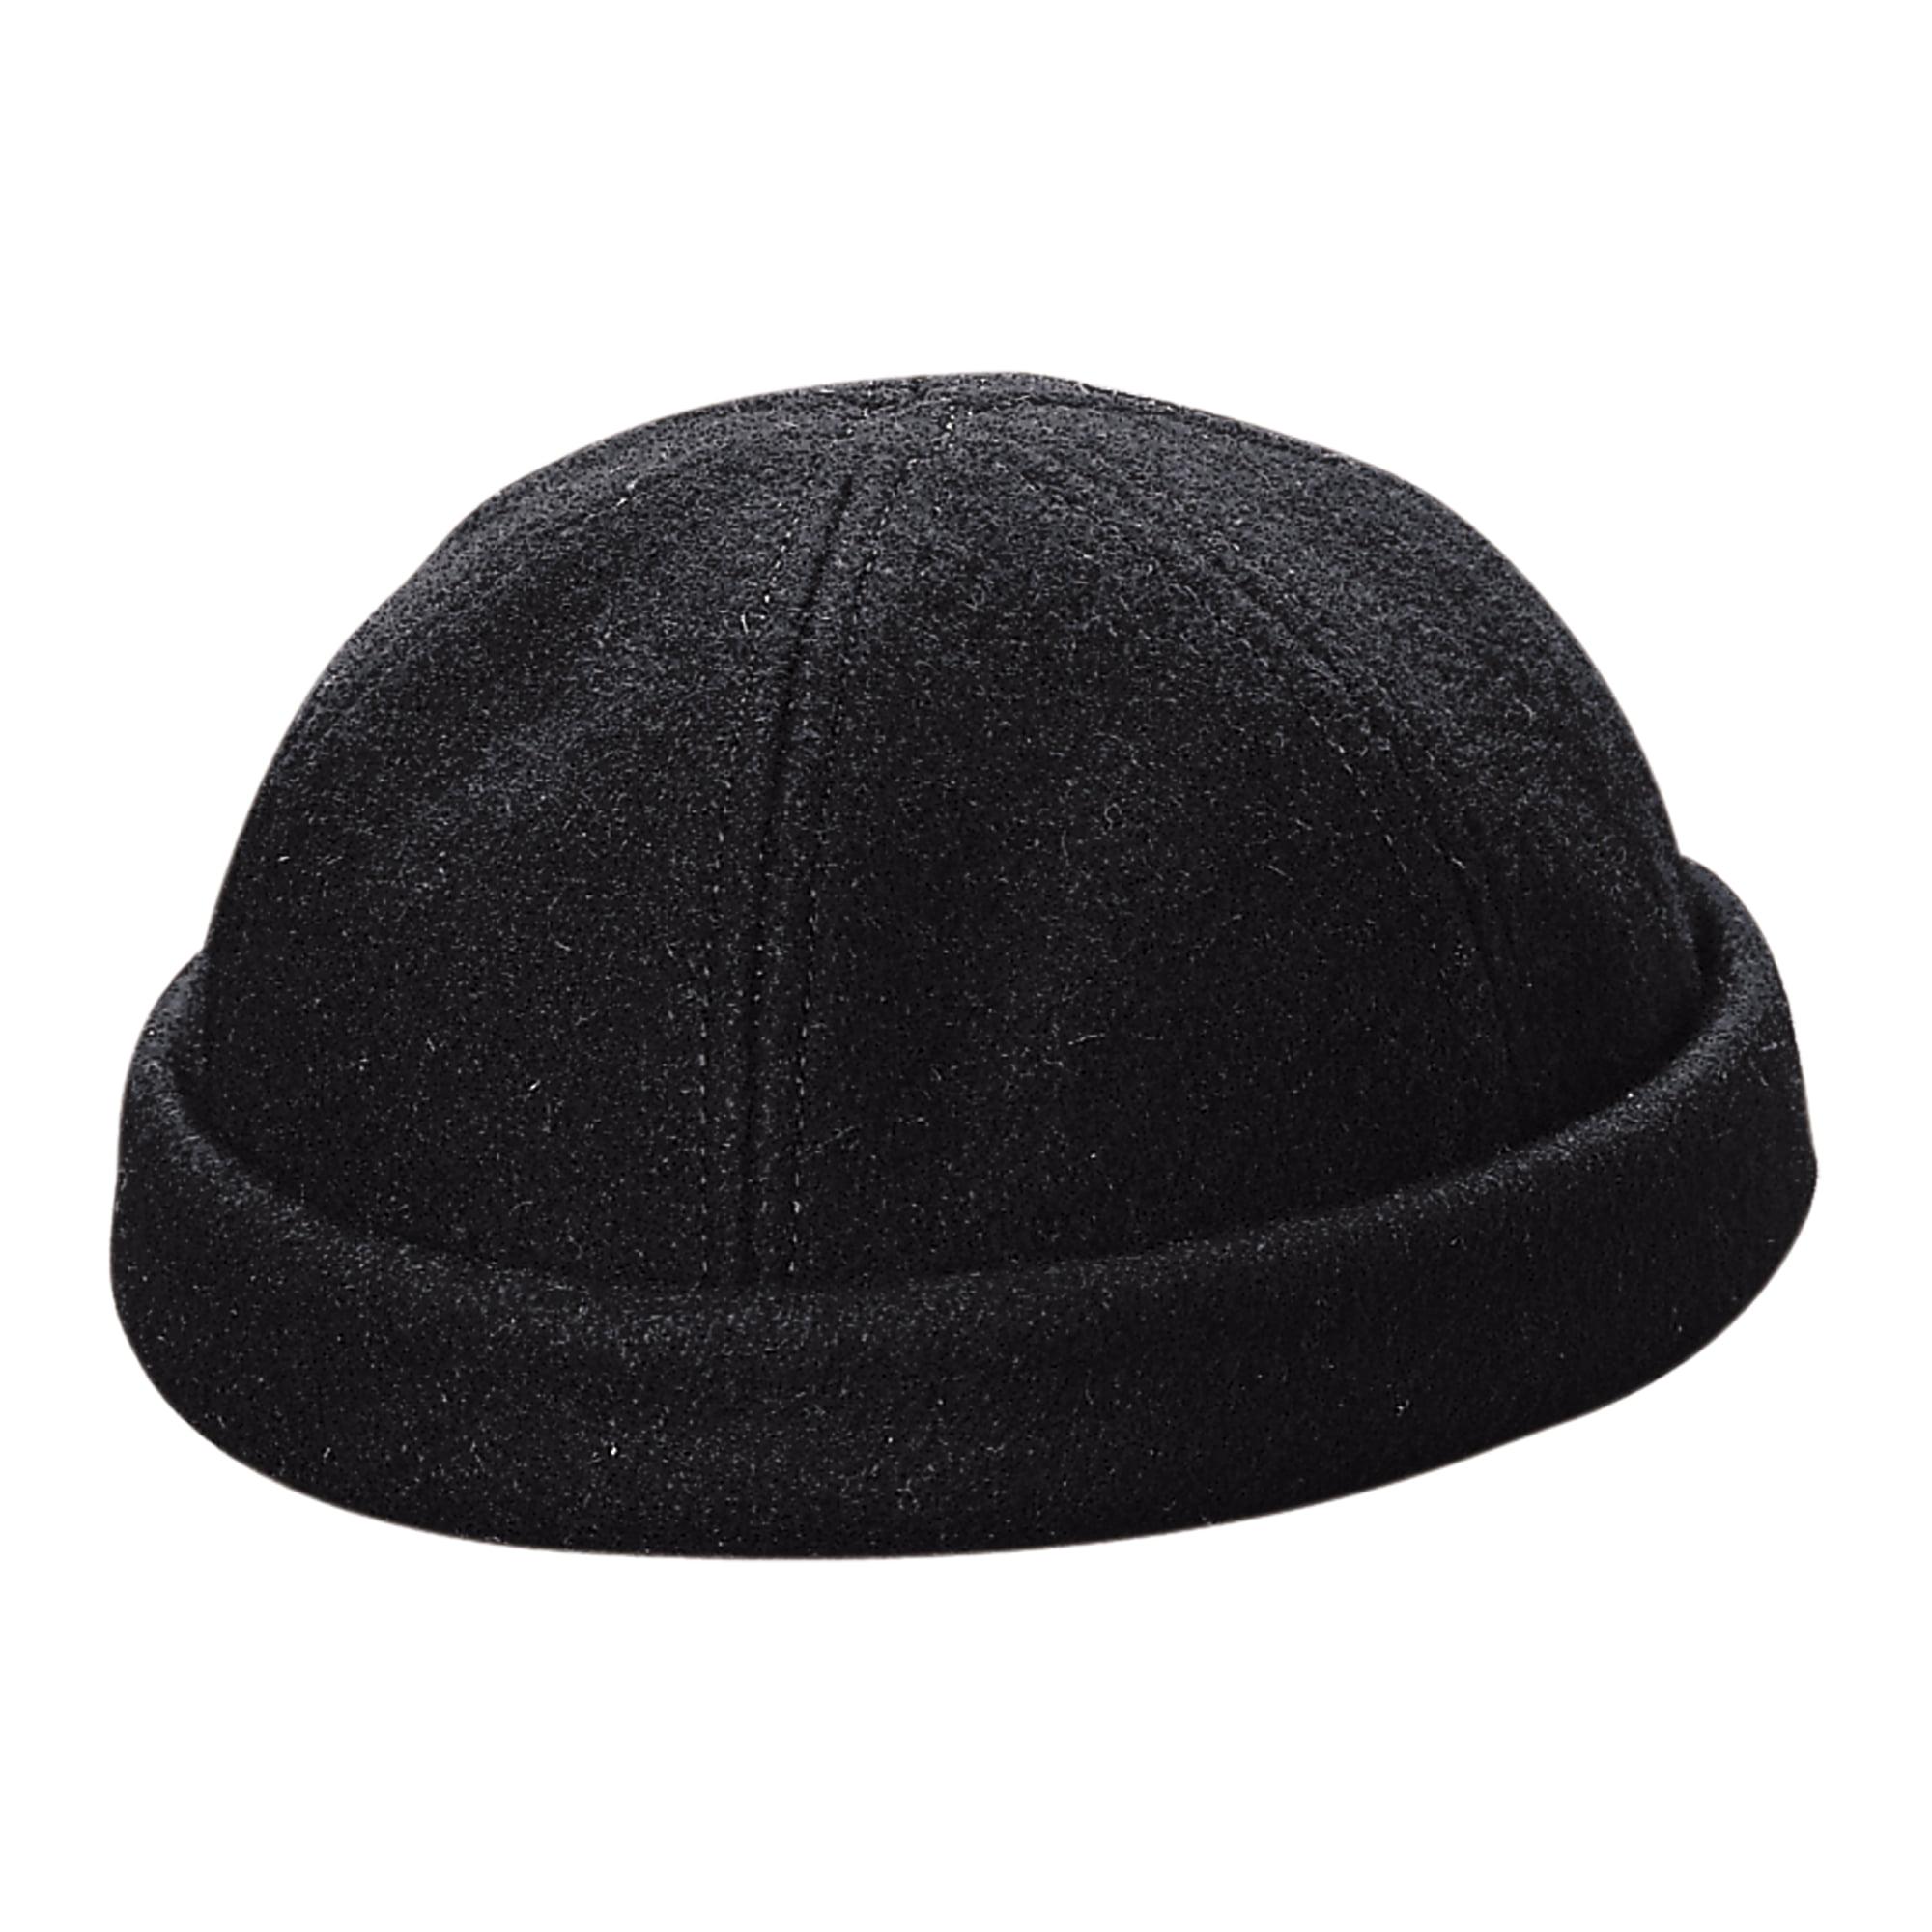 dd008d6c77fe8 Dorfman Pacific - Men s Wool Black Watch Cap Beanie Stocking - Walmart.com